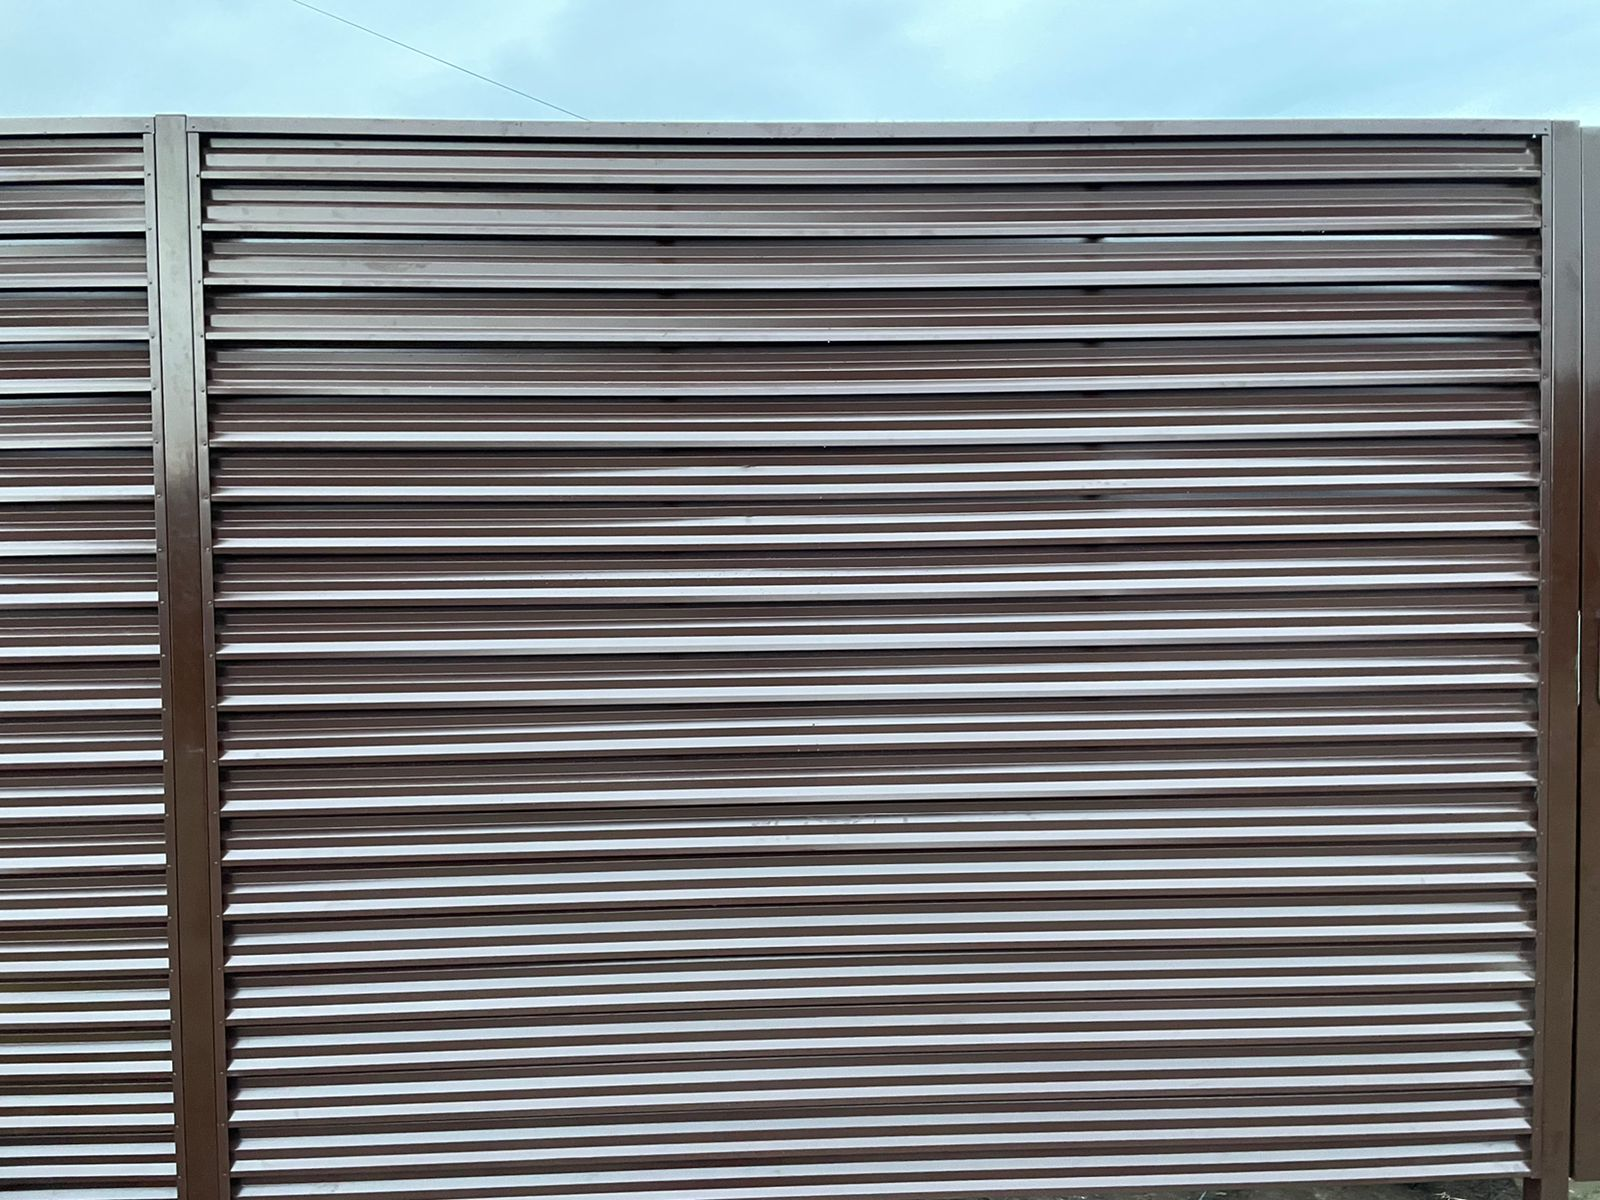 забор-жалюзи с ламелями Елочка шоколад фото6